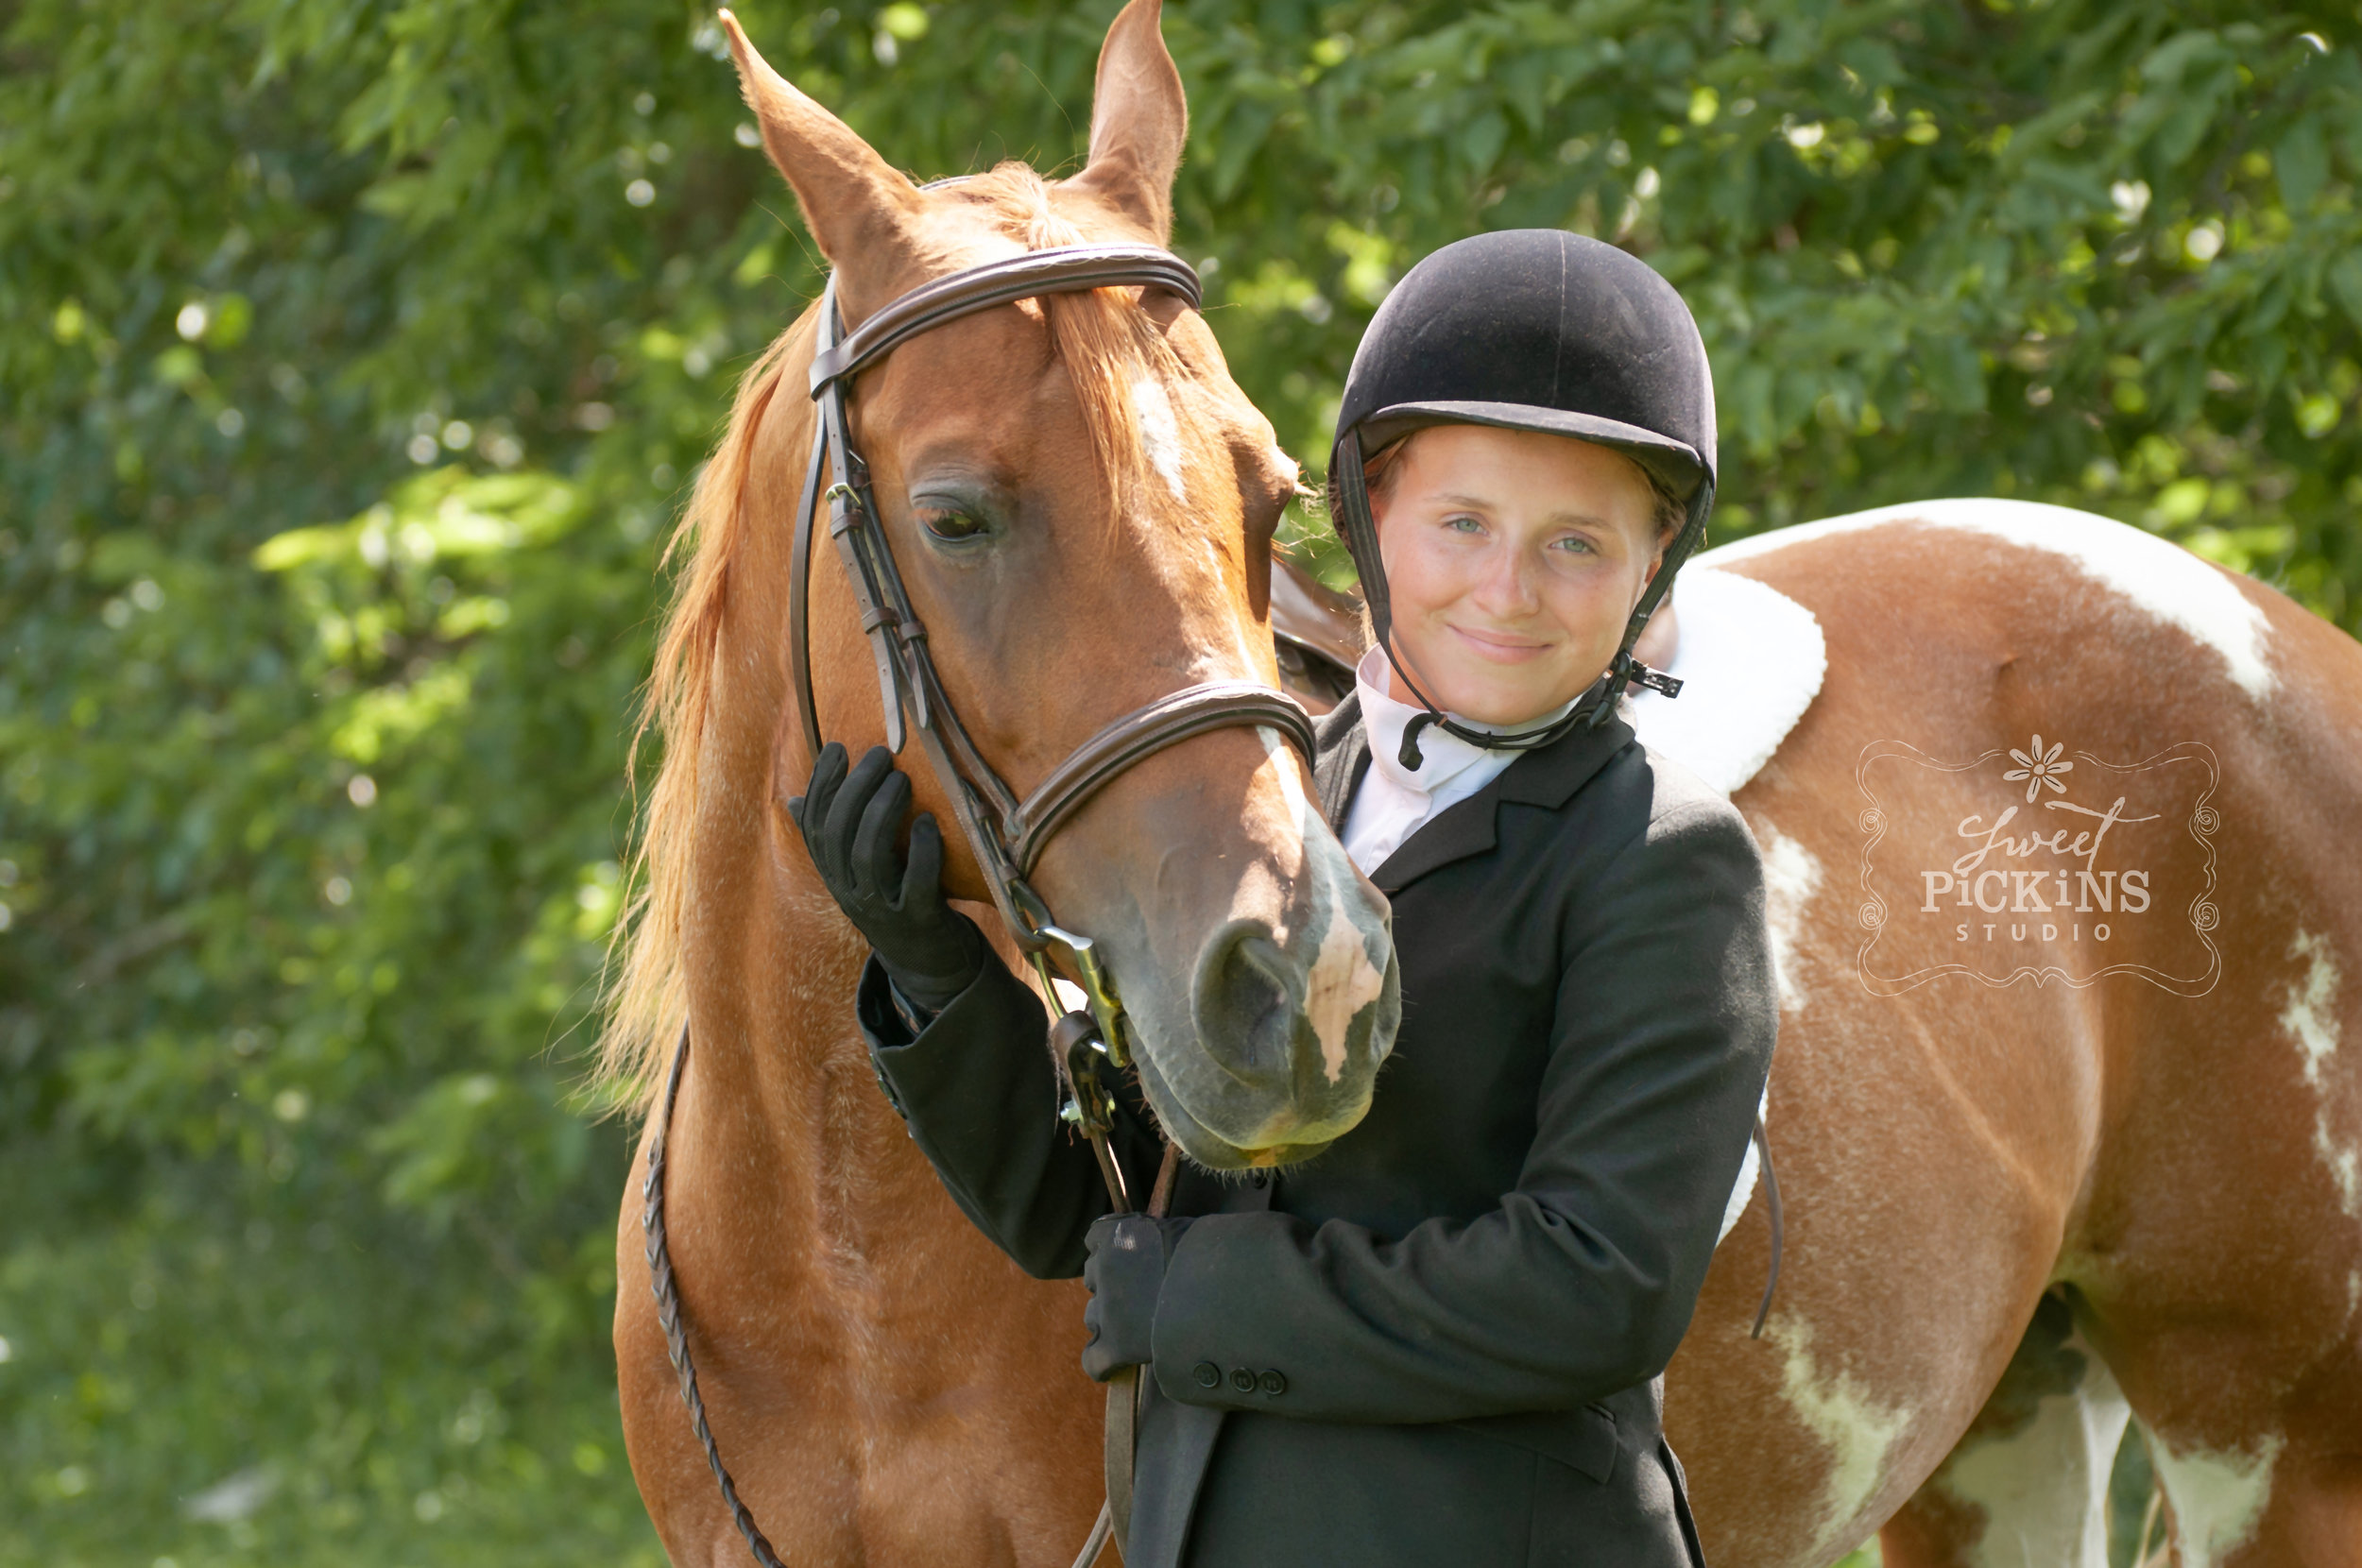 Equestrian Horse Portrait Photography Session